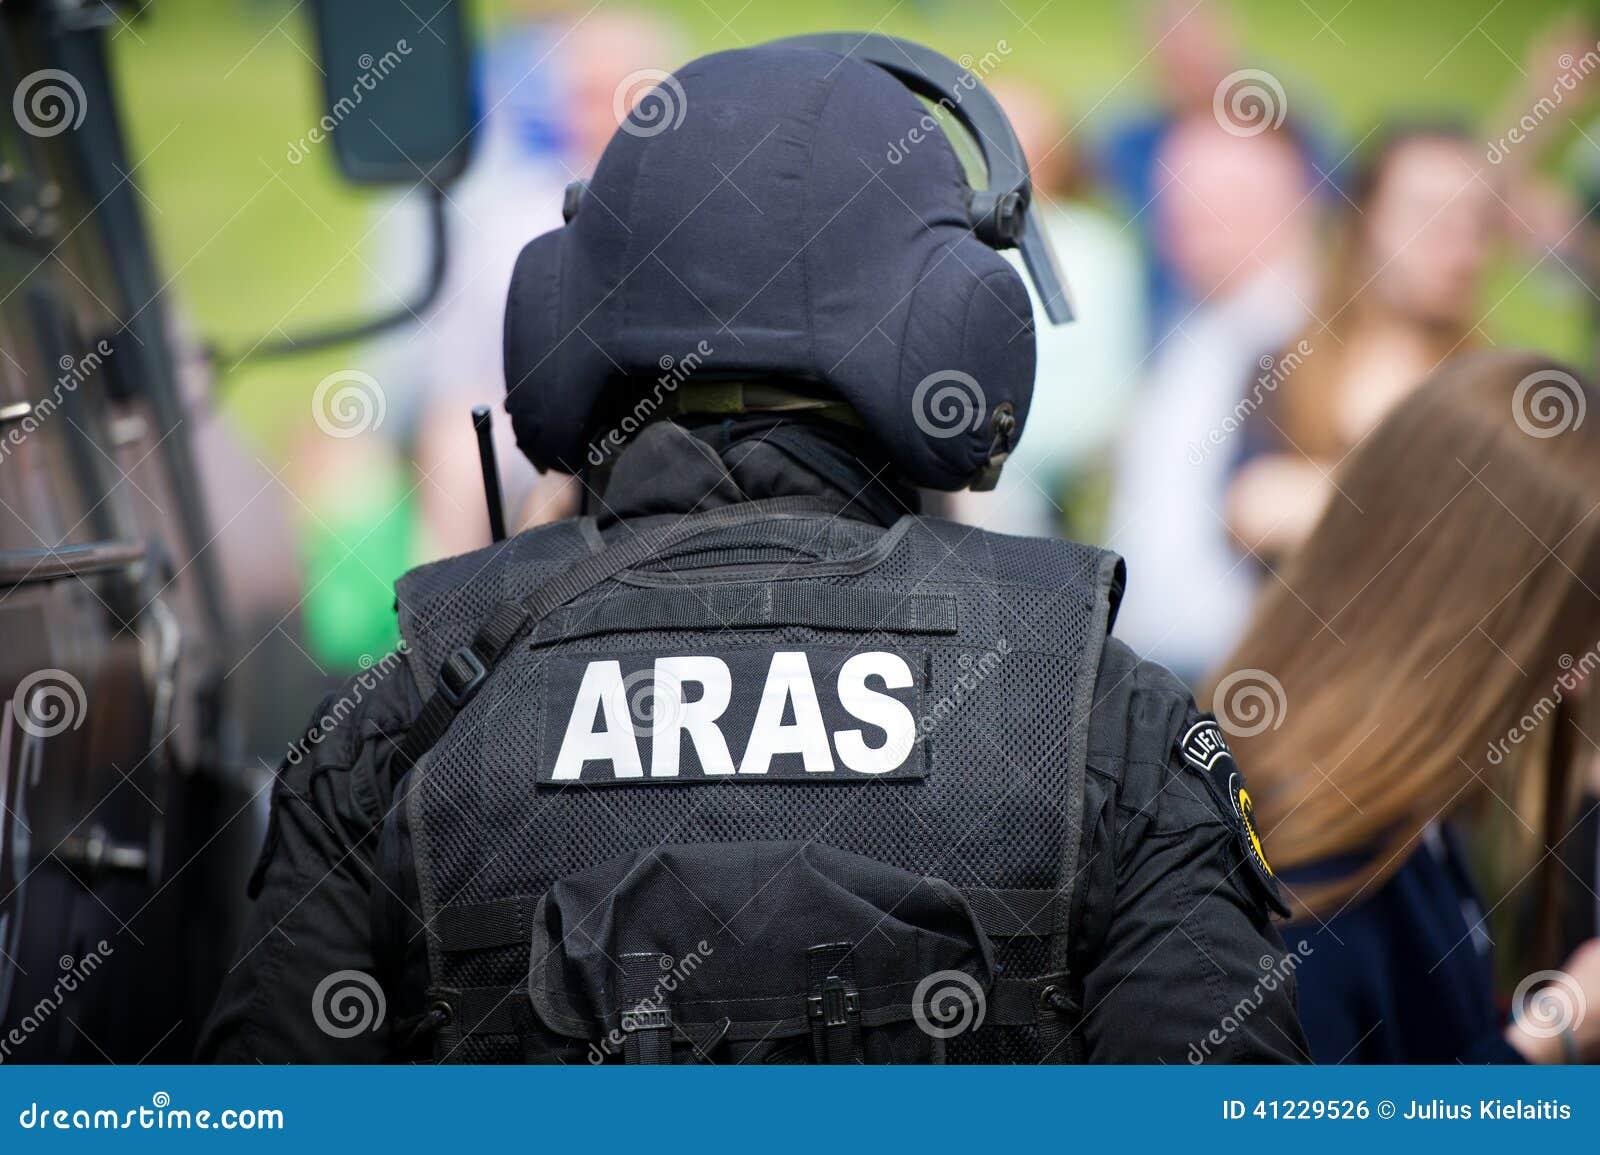 police operations Sun mon tue wed thu fri sat 22 23 24 25 26 27 28 29 30 31 1 2 3 4 5 6 7 8 9 10 11 4 5 6 7 8 9 10 11 12 13 14 15 16 17 18 19 20 21 22 23 24 2 3 4 5 6 7 8.